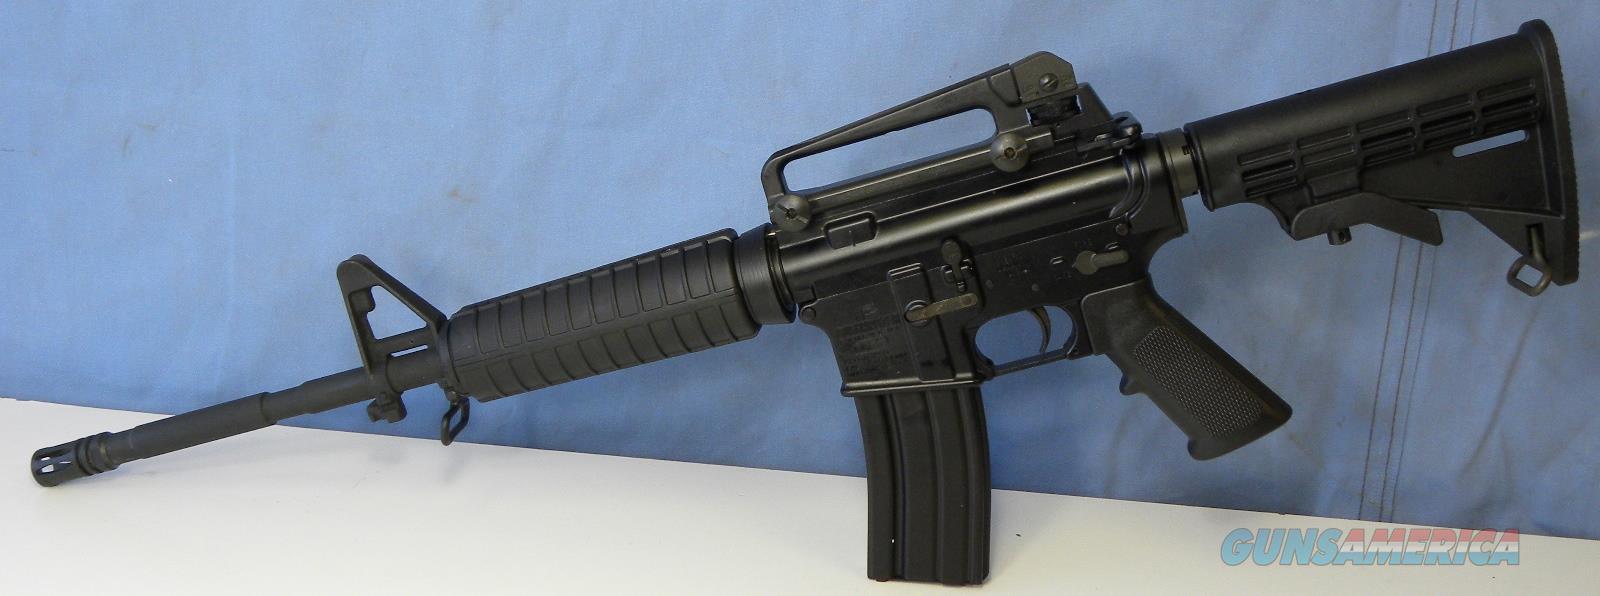 Bushmaster M4 A3 Patrolman  Guns > Rifles > Bushmaster Rifles > Complete Rifles